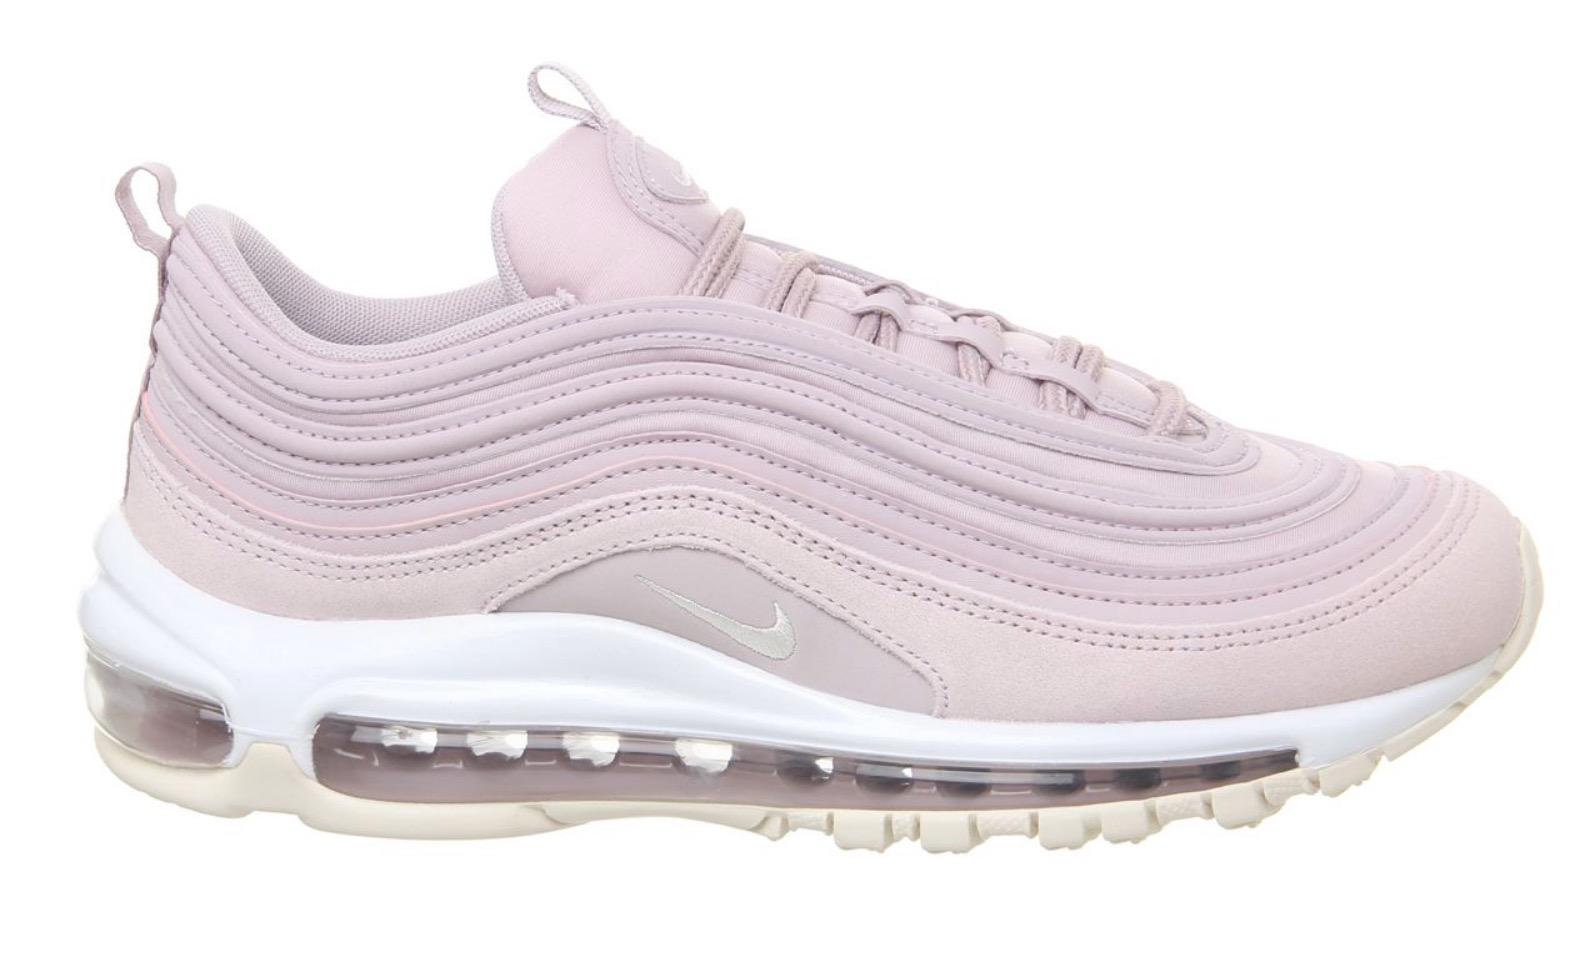 Nike Air Max 97 Pink White